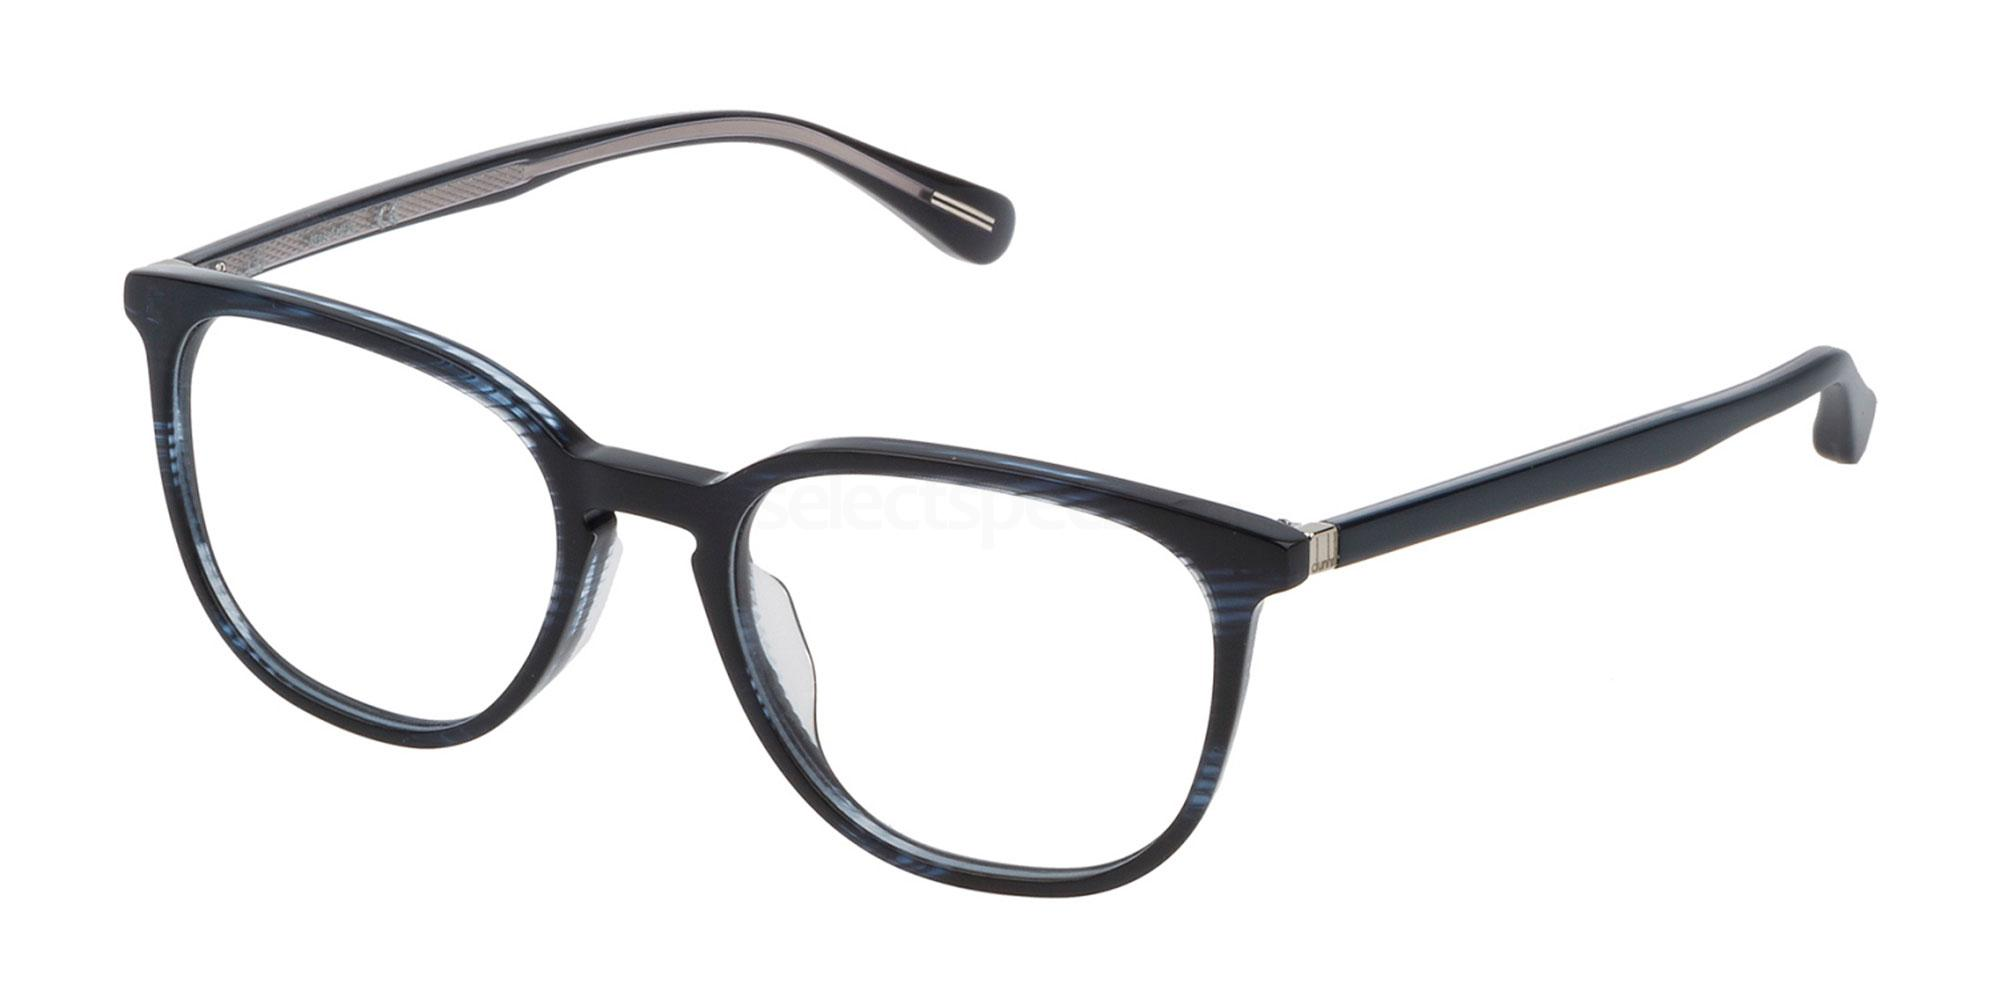 06WR VDH119 Glasses, Dunhill London